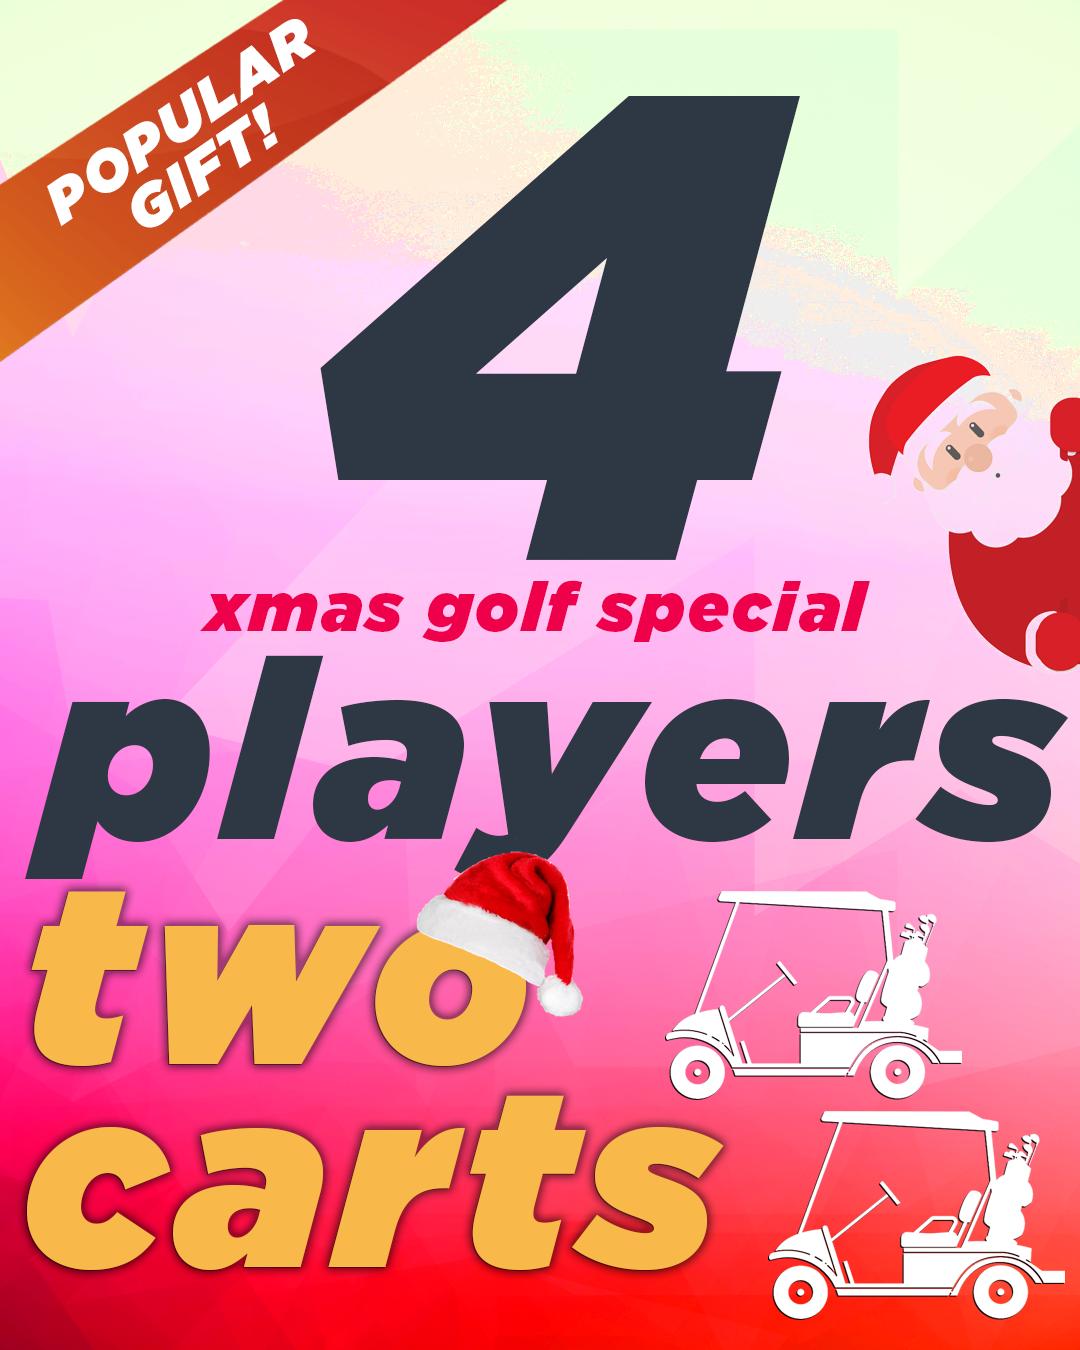 XMAS Golf Special - 4 Players & 2 Carts